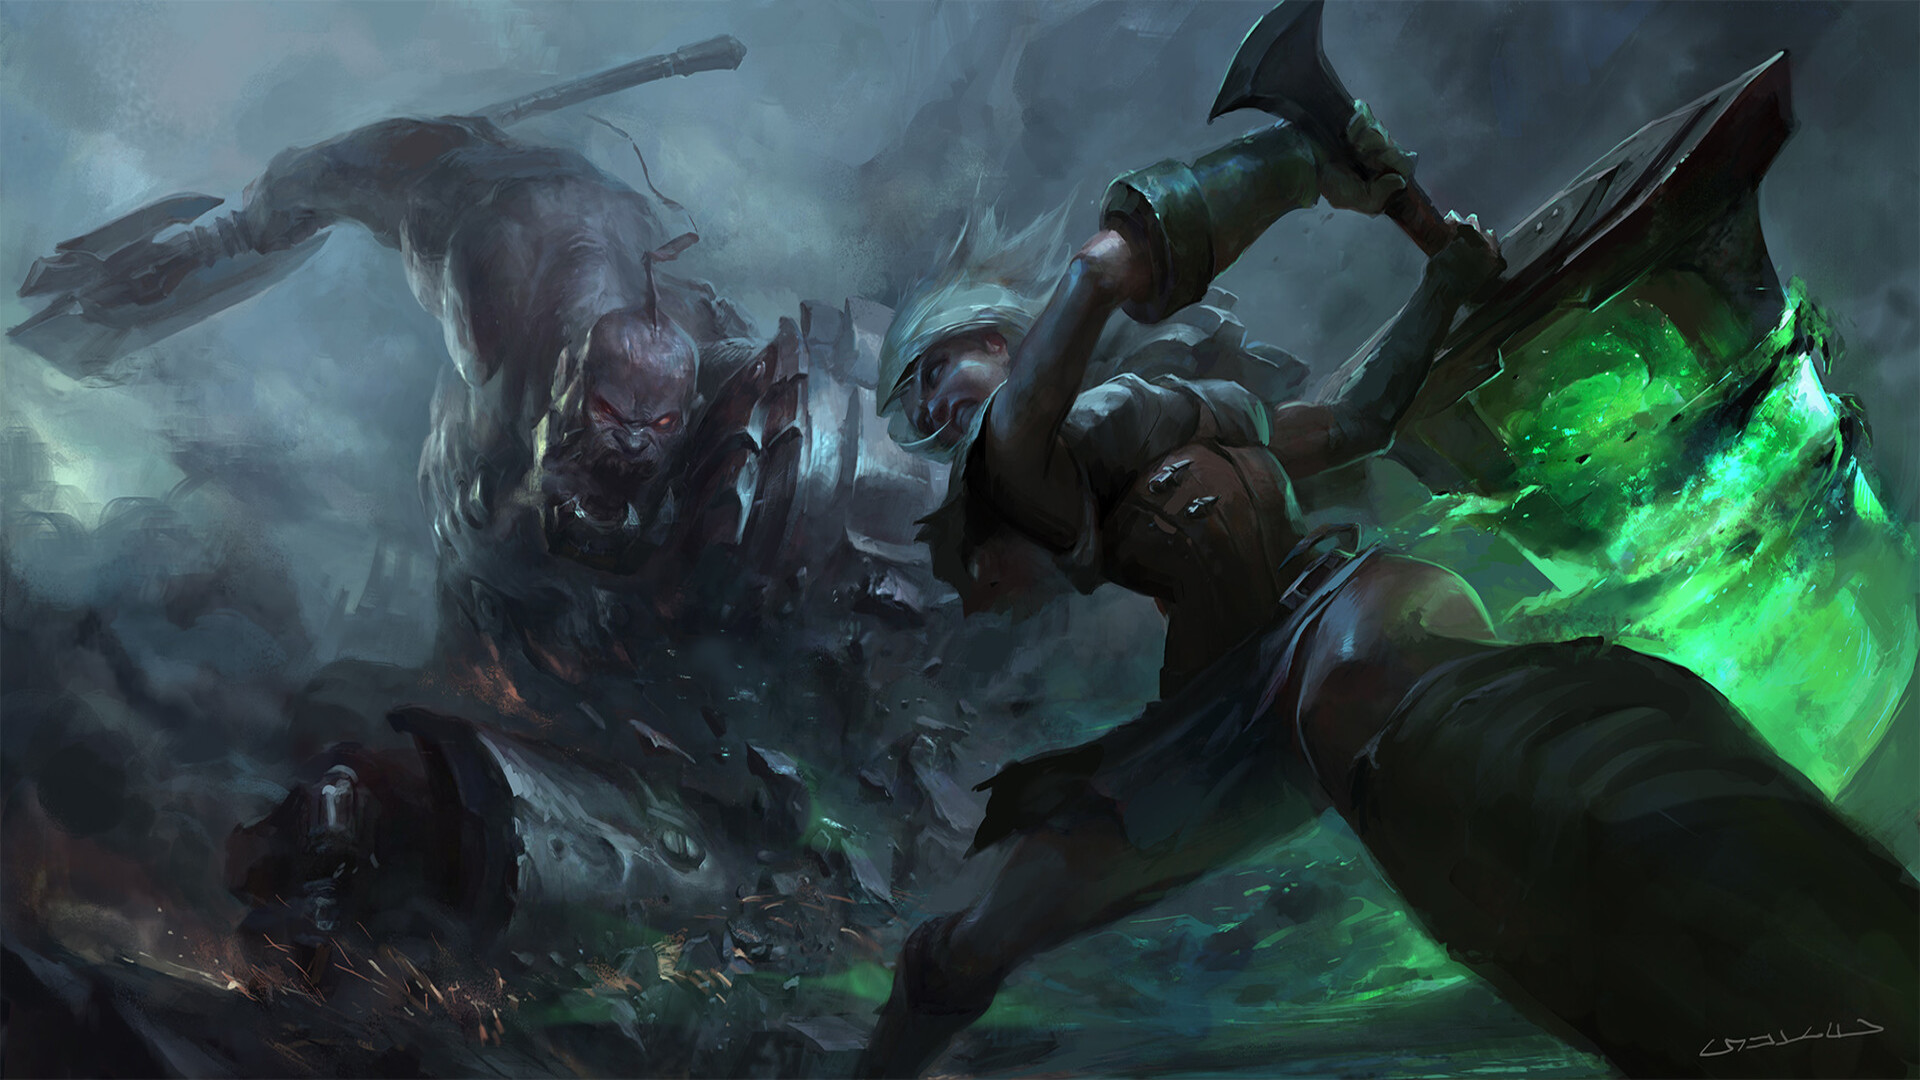 League Of Legends Hd Wallpaper Background Image